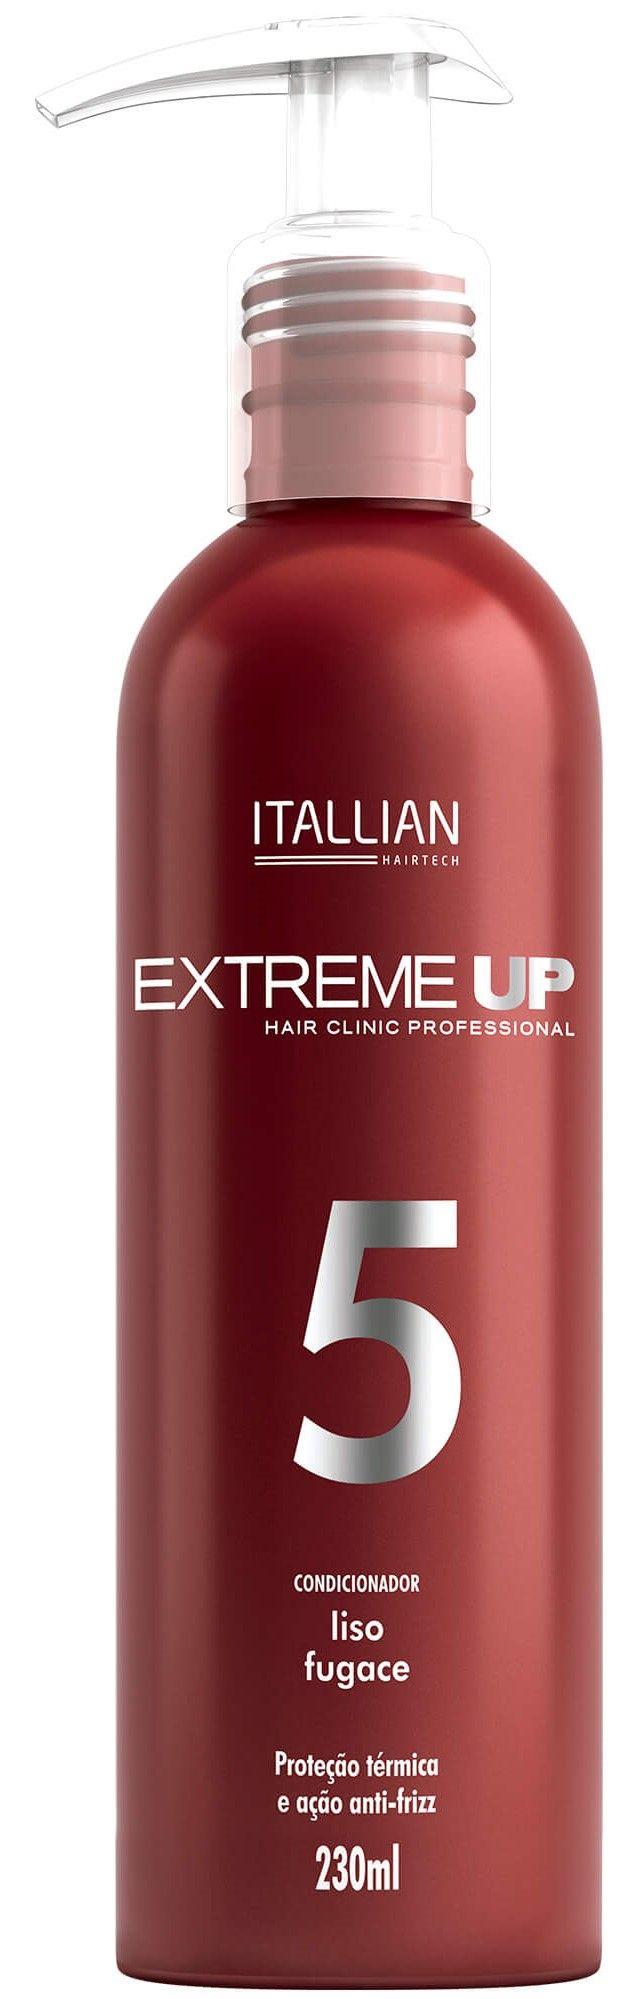 Protetor Térmico Liso Fugace Itallian Extreme Up 5 - 230ml